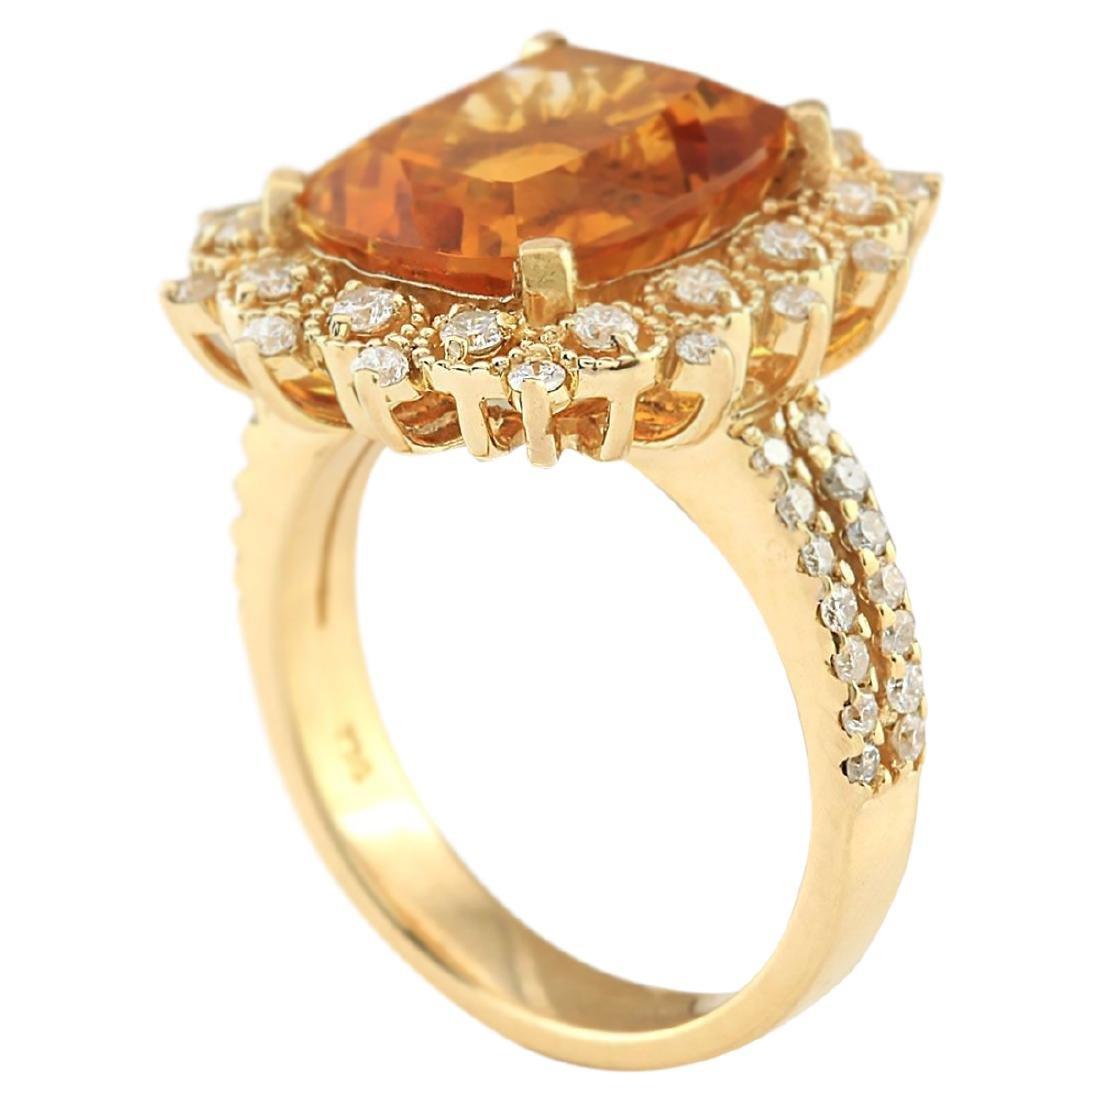 6.39 CTW Natural Madeira Citrine And Diamond Ring 18K - 3